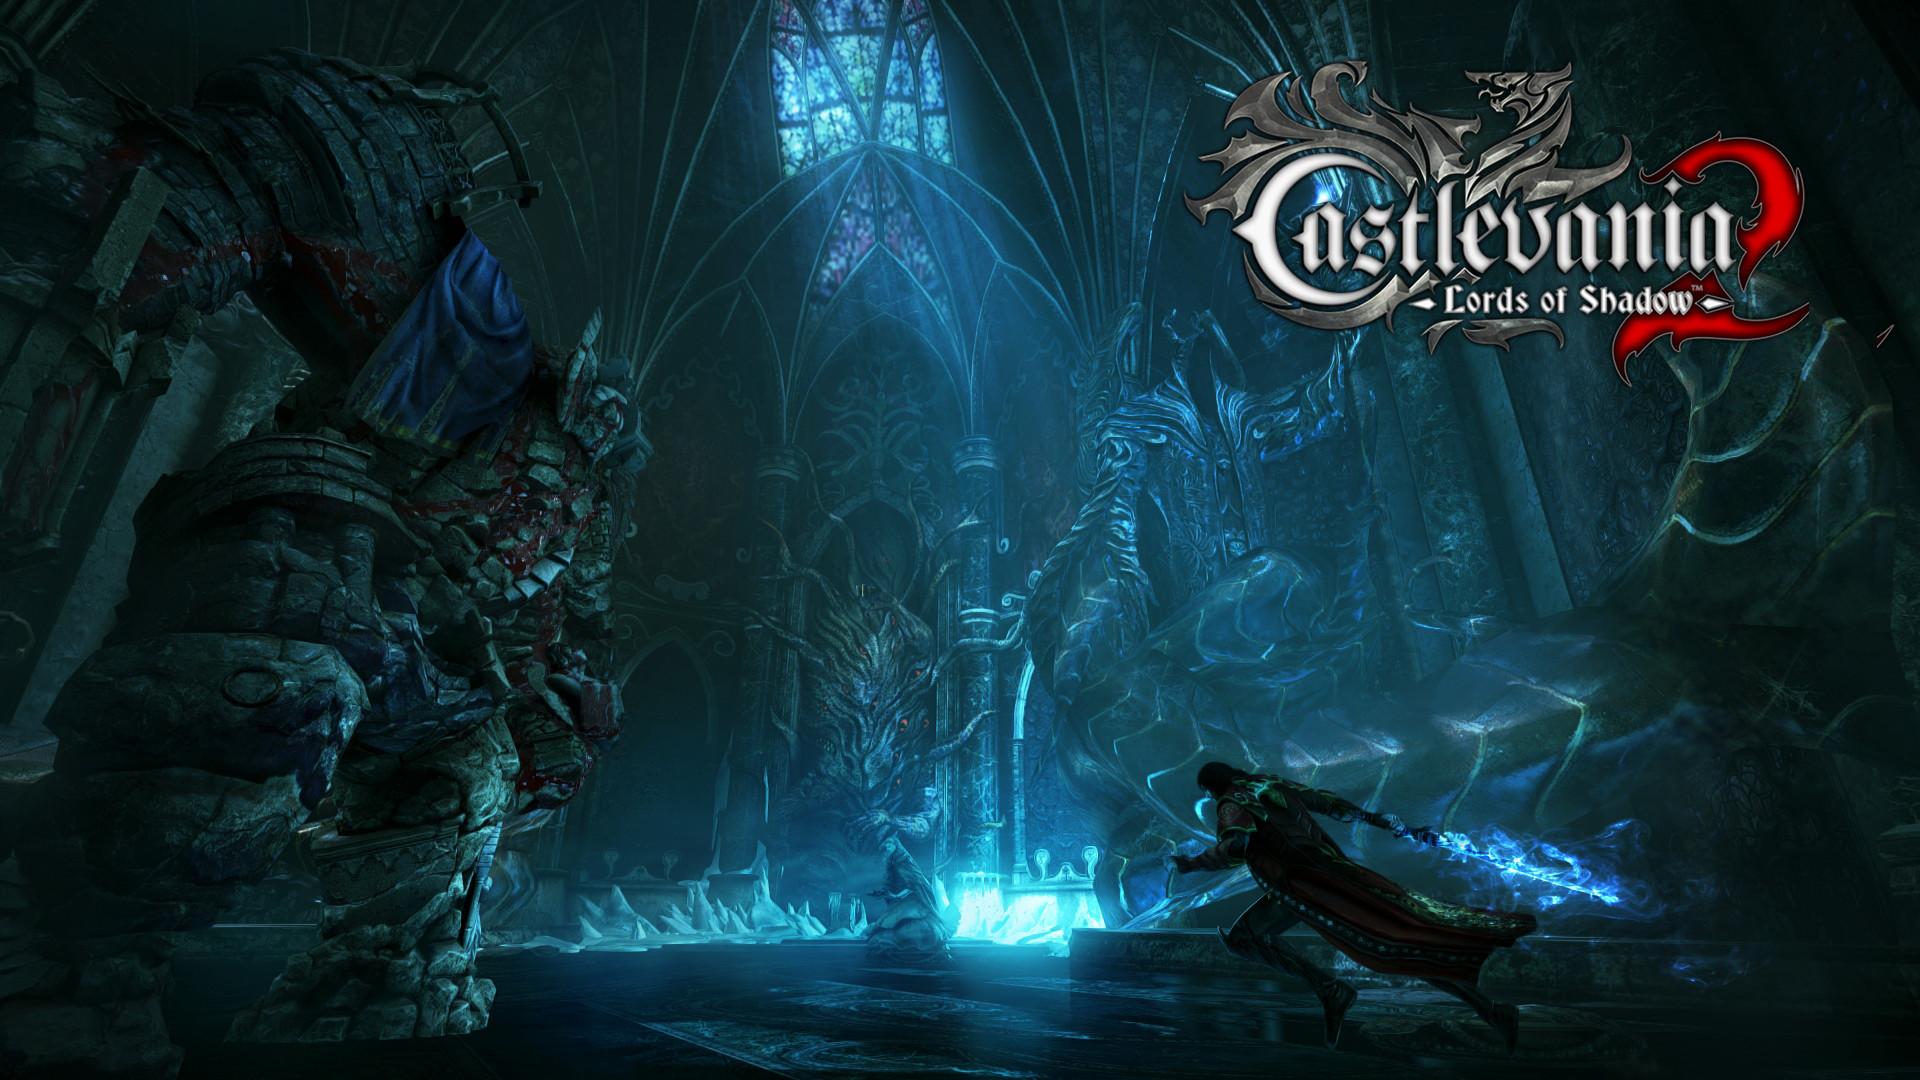 Wallpaper castlevania lords of shadow 2, count dracula, satan,  belmont, alucard